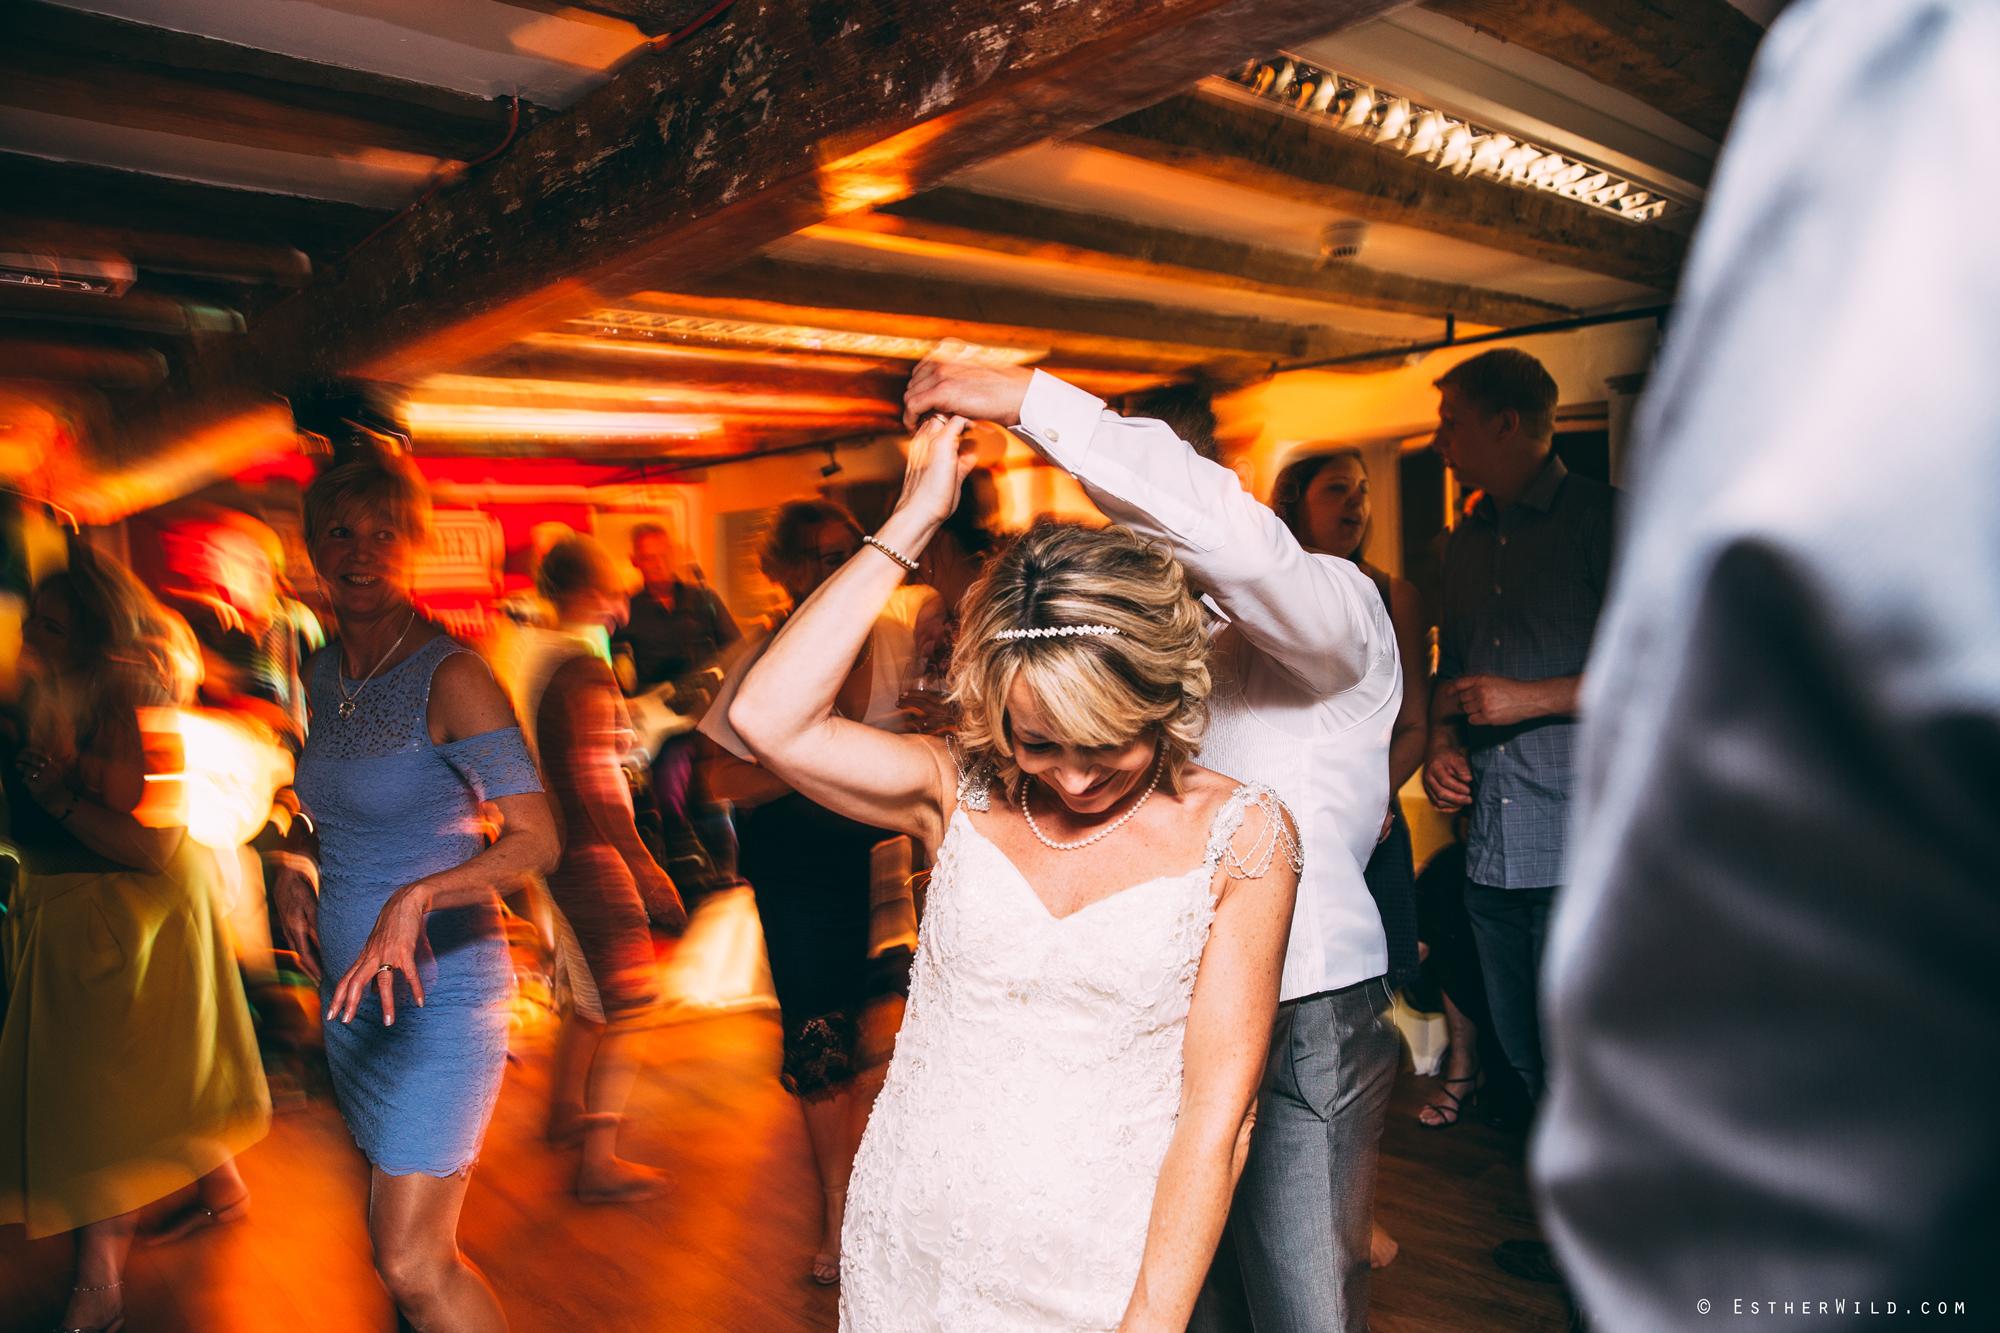 0817_Rathskellar_Kings_Lynn_East_Lexham_Church_Wedding_Photographer_Esther_Wild_IMG_2990.jpg